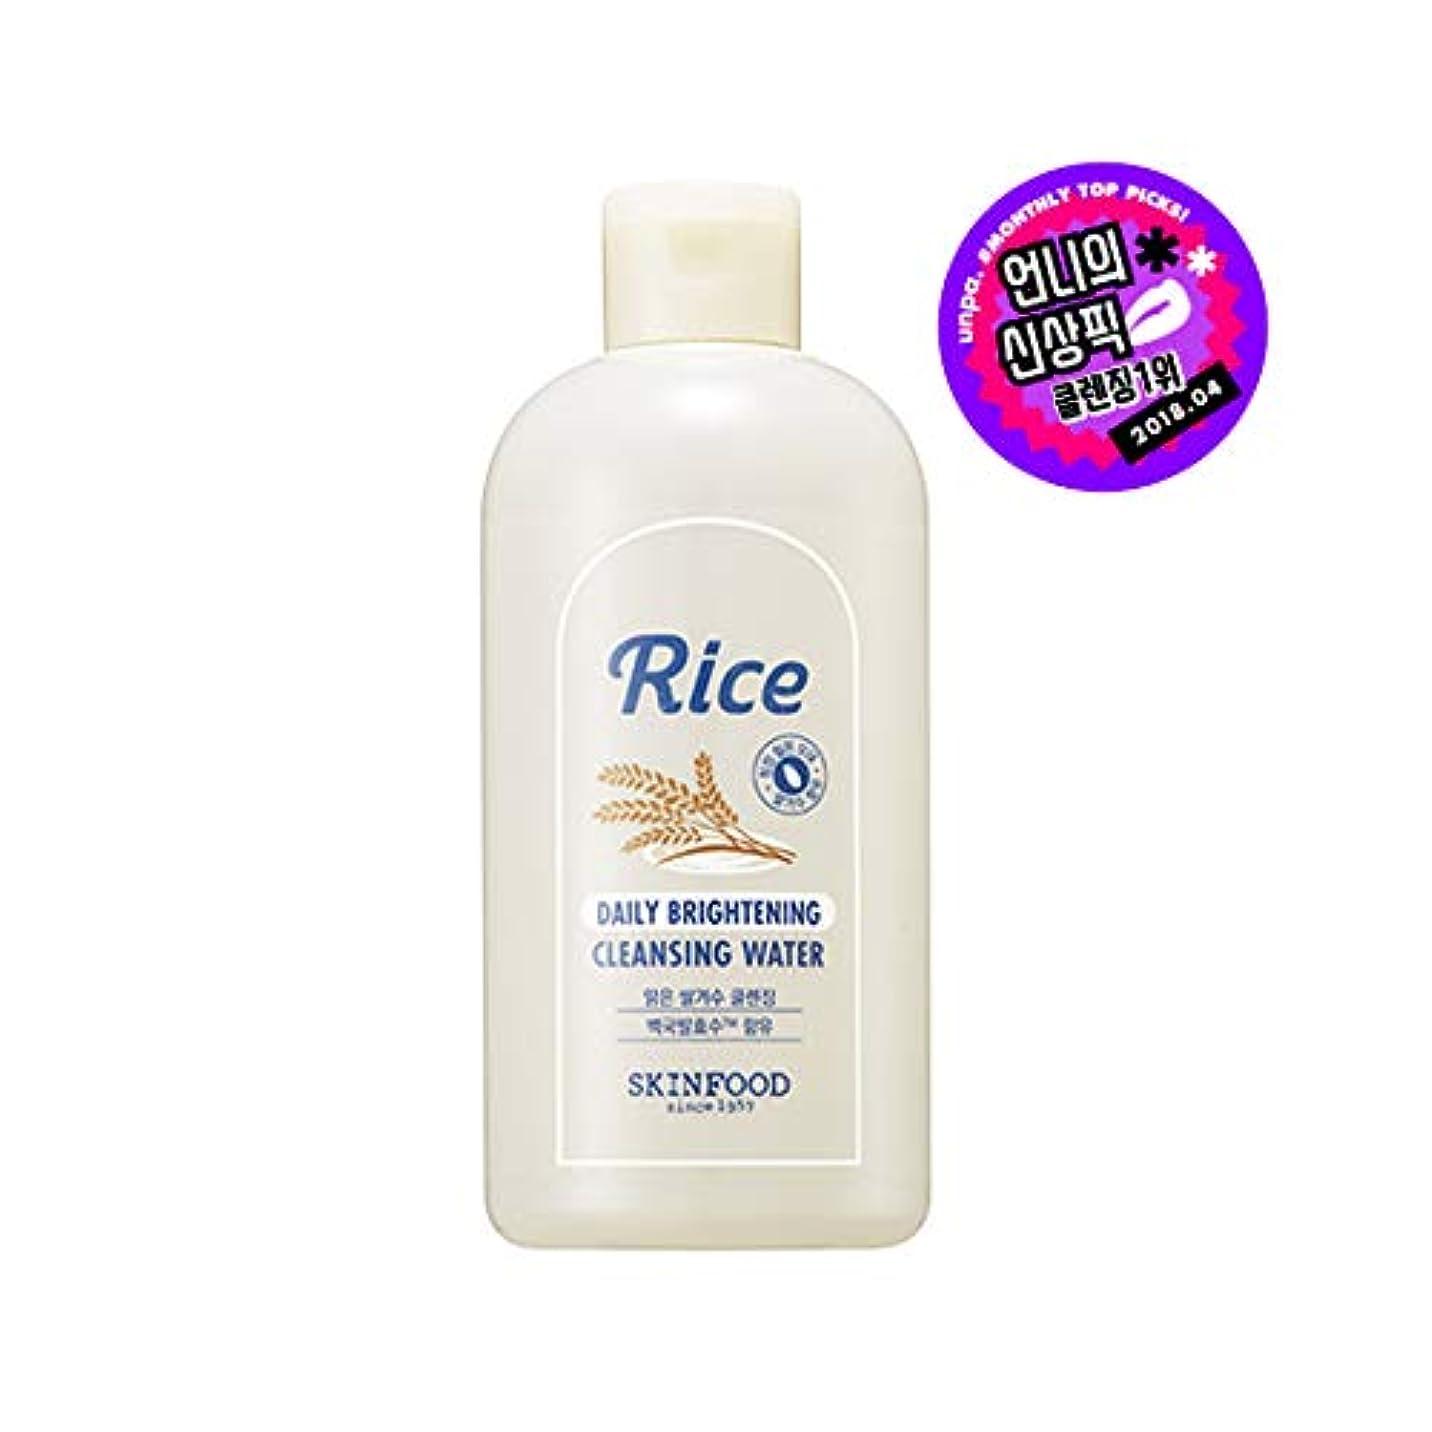 Skinfood/Rice Daily Brightening Mask Cleansing Water/ライスデイリーブライトニングマスククレンジングウォーター/300ml [並行輸入品]